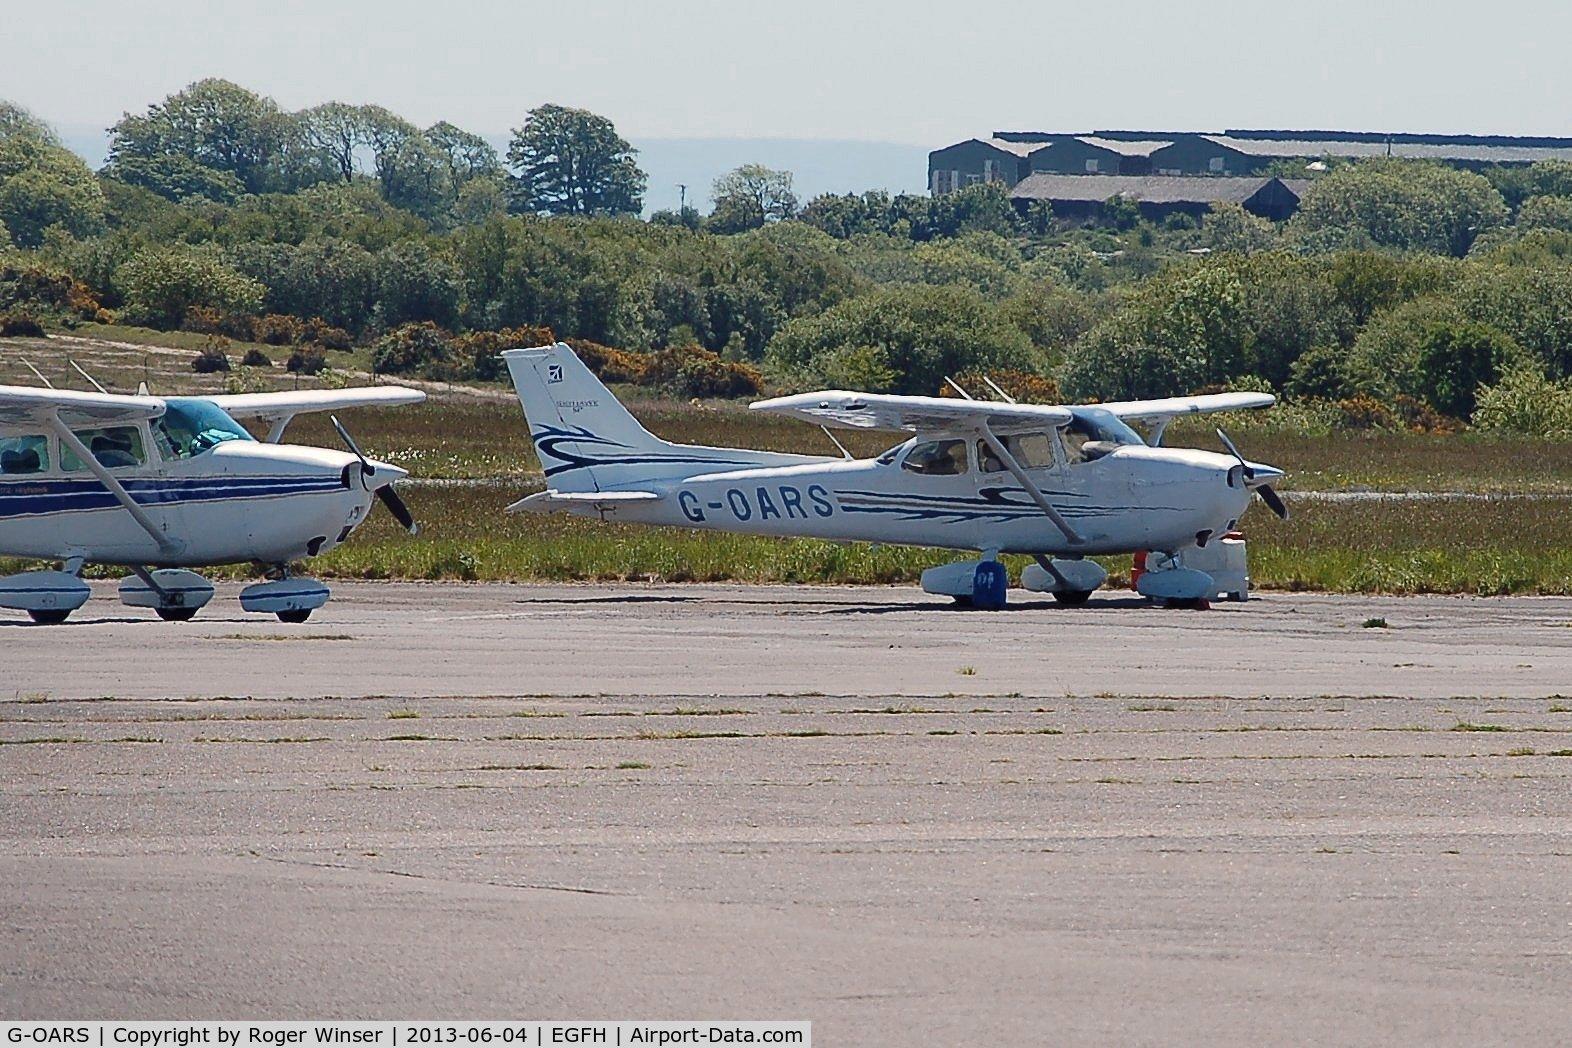 G-OARS, 2010 Cessna 172S Skyhawk C/N 172S11048, Visiting Cessna Skyhawk SP.